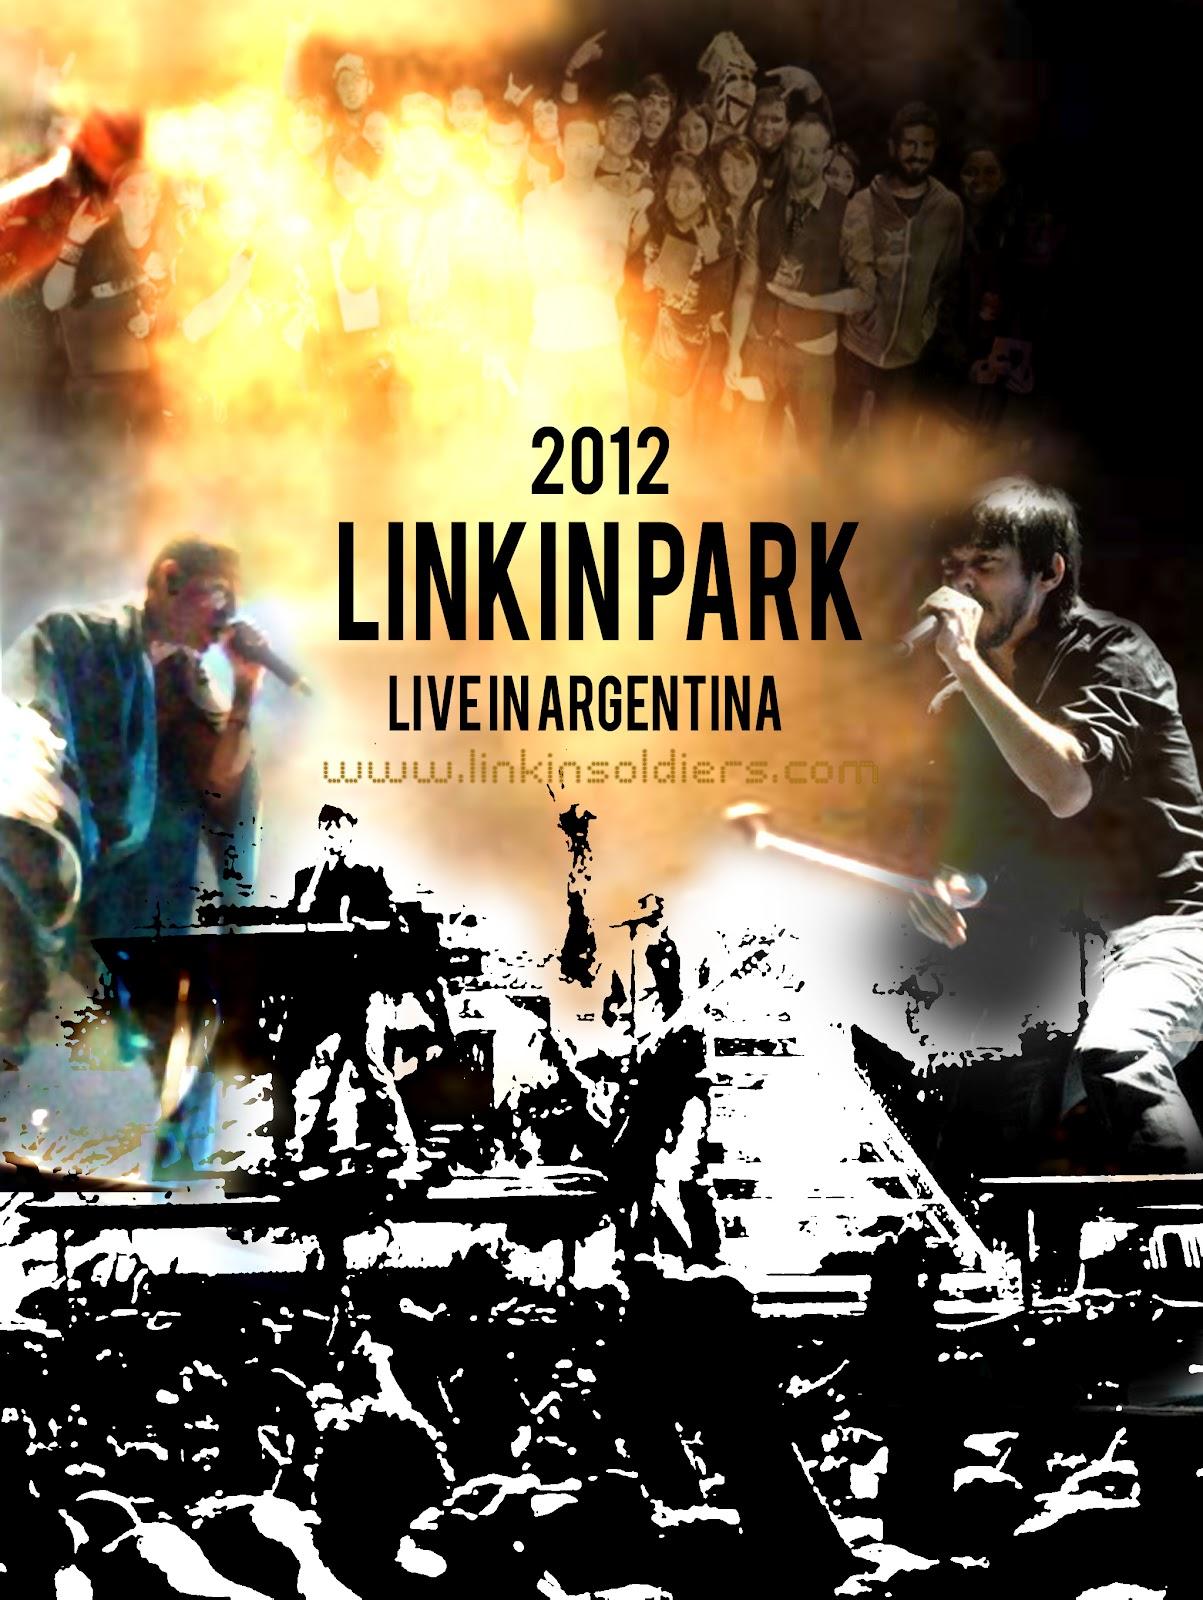 http://1.bp.blogspot.com/-Z5NR7gFQjUQ/UATAC9Clj7I/AAAAAAAAAIM/CS1mumx7QVI/s1600/Linkin+Park+en+Argentina+2012.jpg?width=461